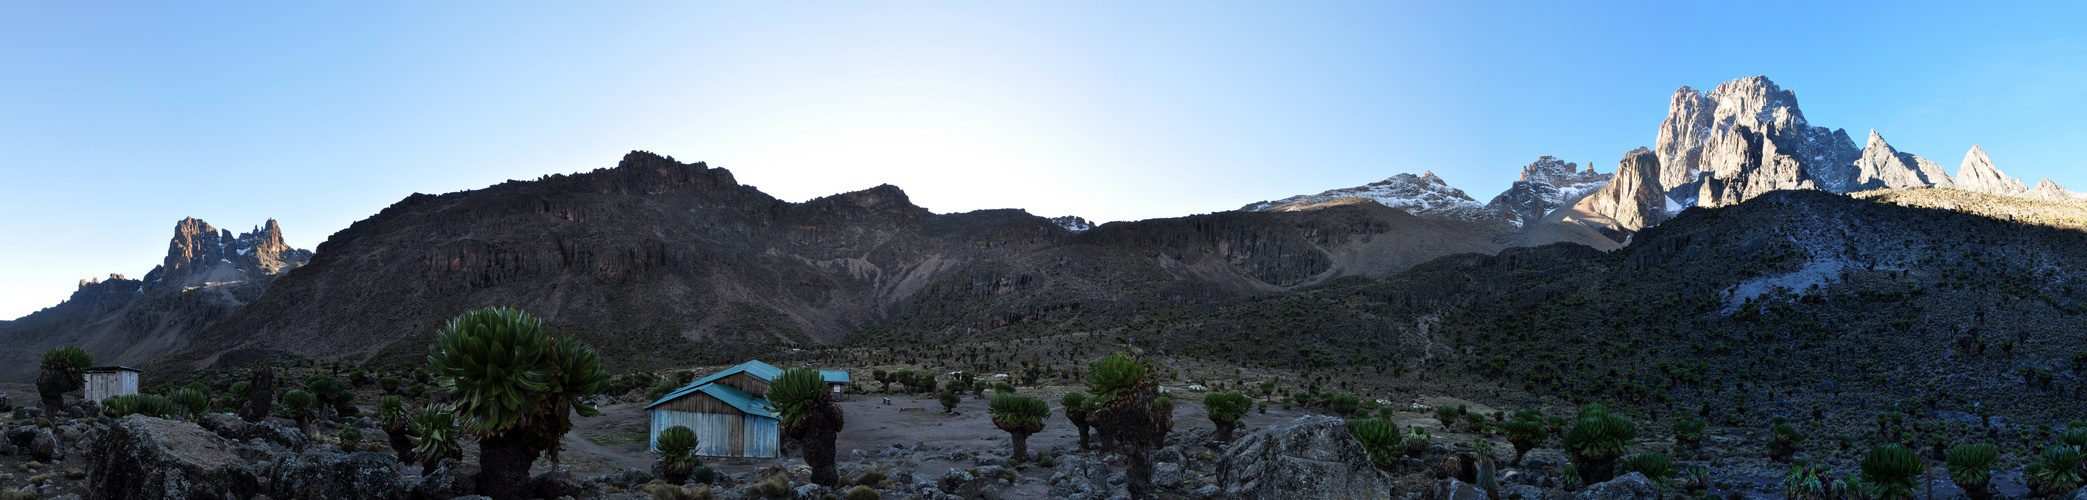 Panorama am Mount Kenia